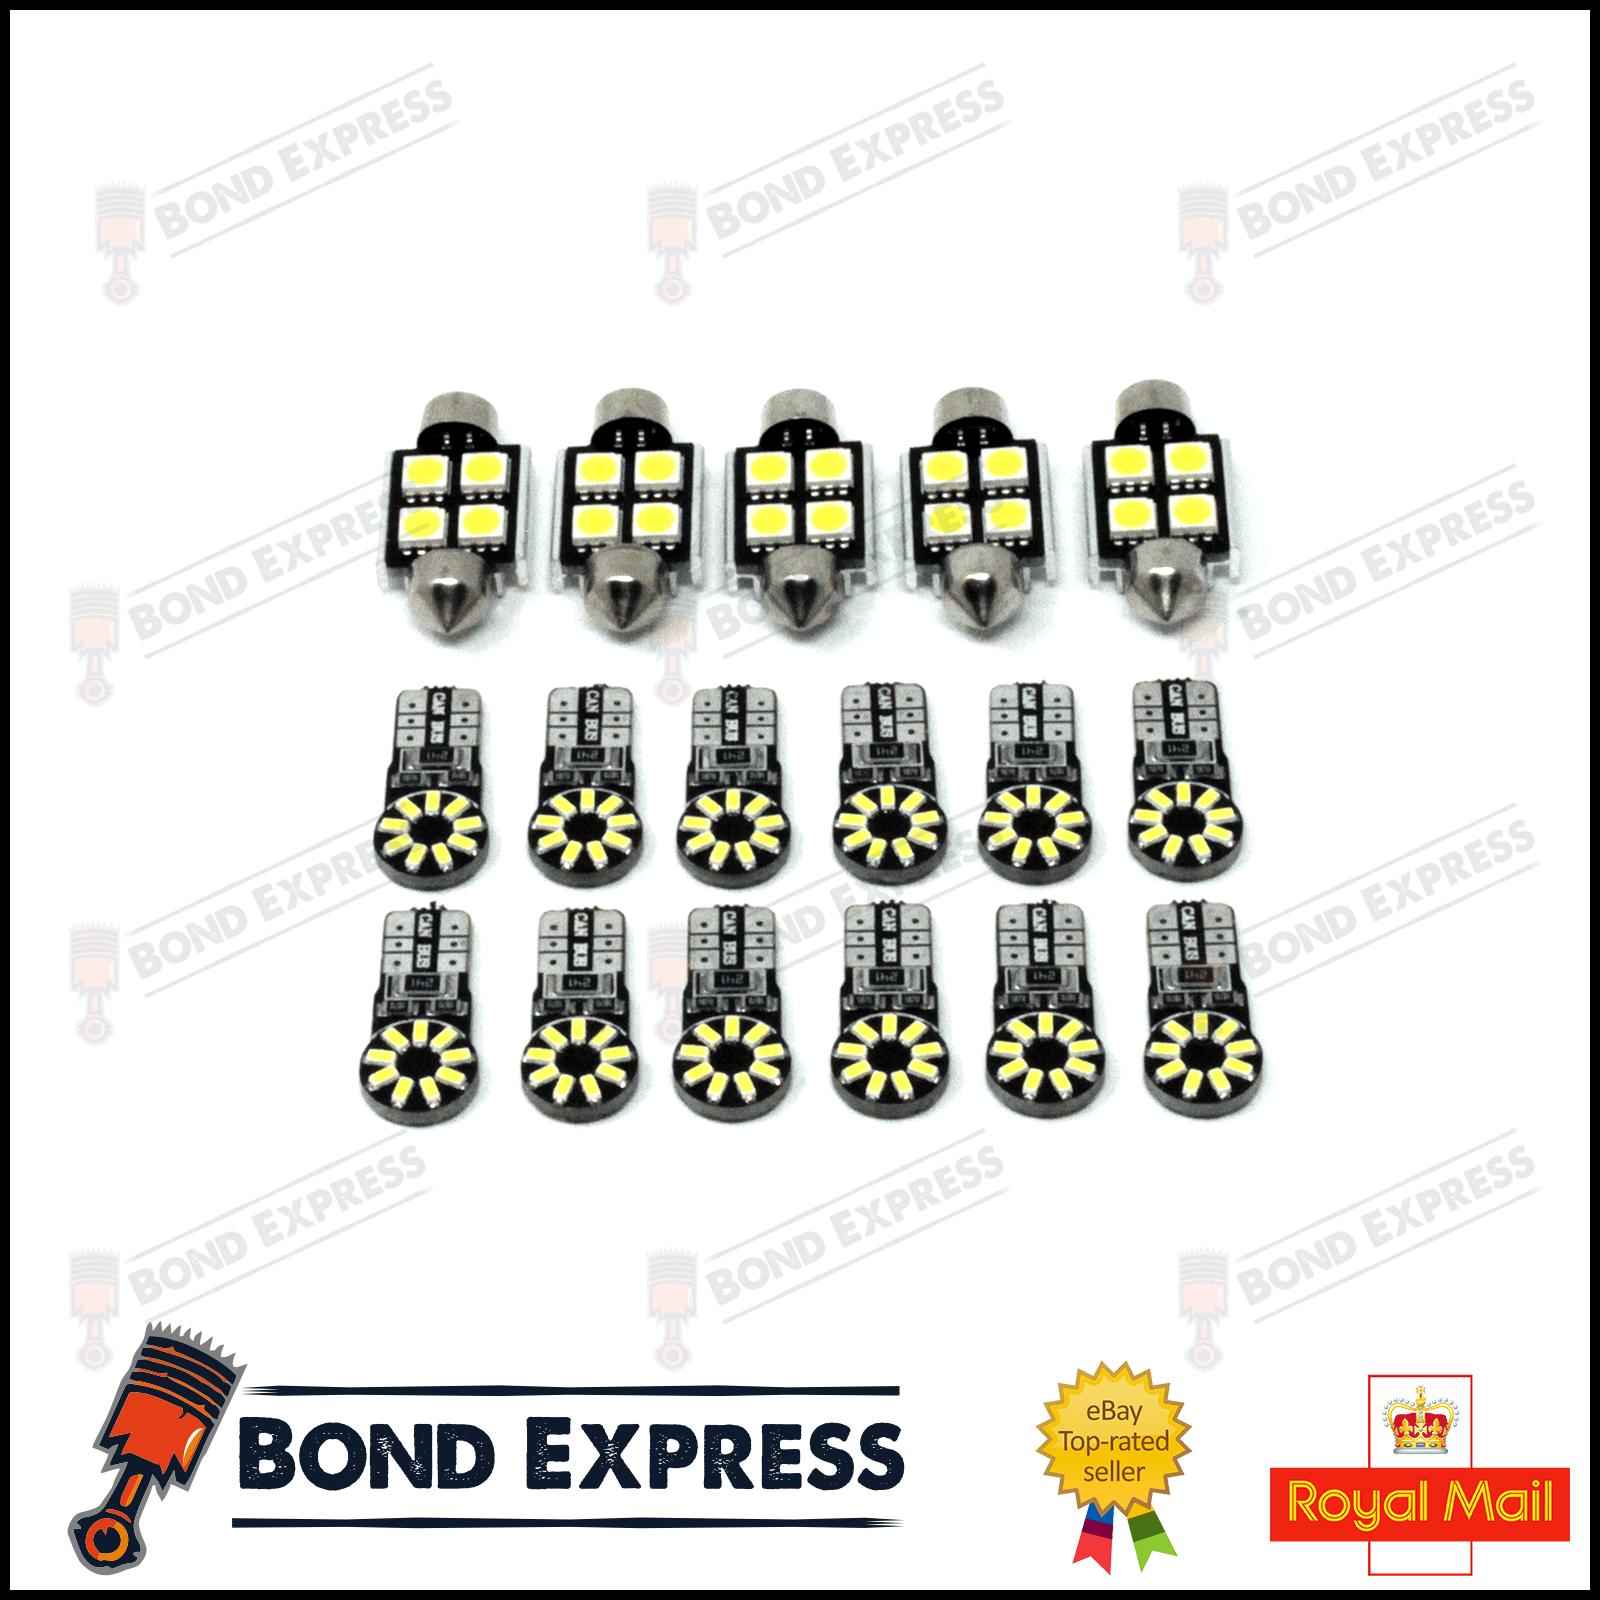 Bmw 5 Series E61 Interior Led Kit Bond Express Ebay E60 Sunflower 1